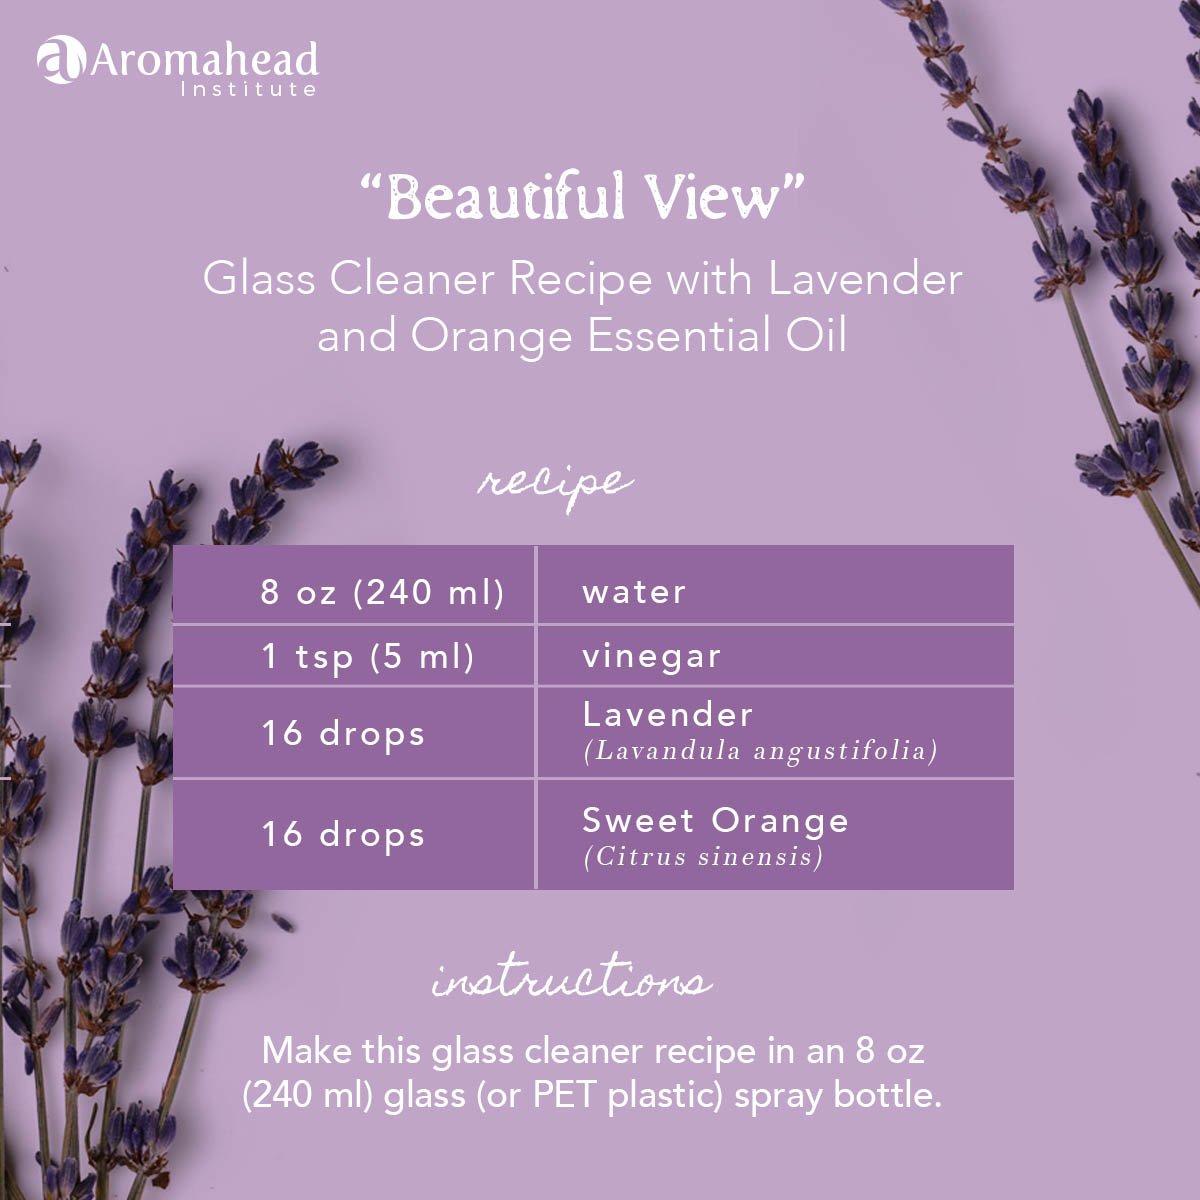 Oct 7 2019 - Blog - Recipe  - Beautiful View - 1200 x 1200 - V1